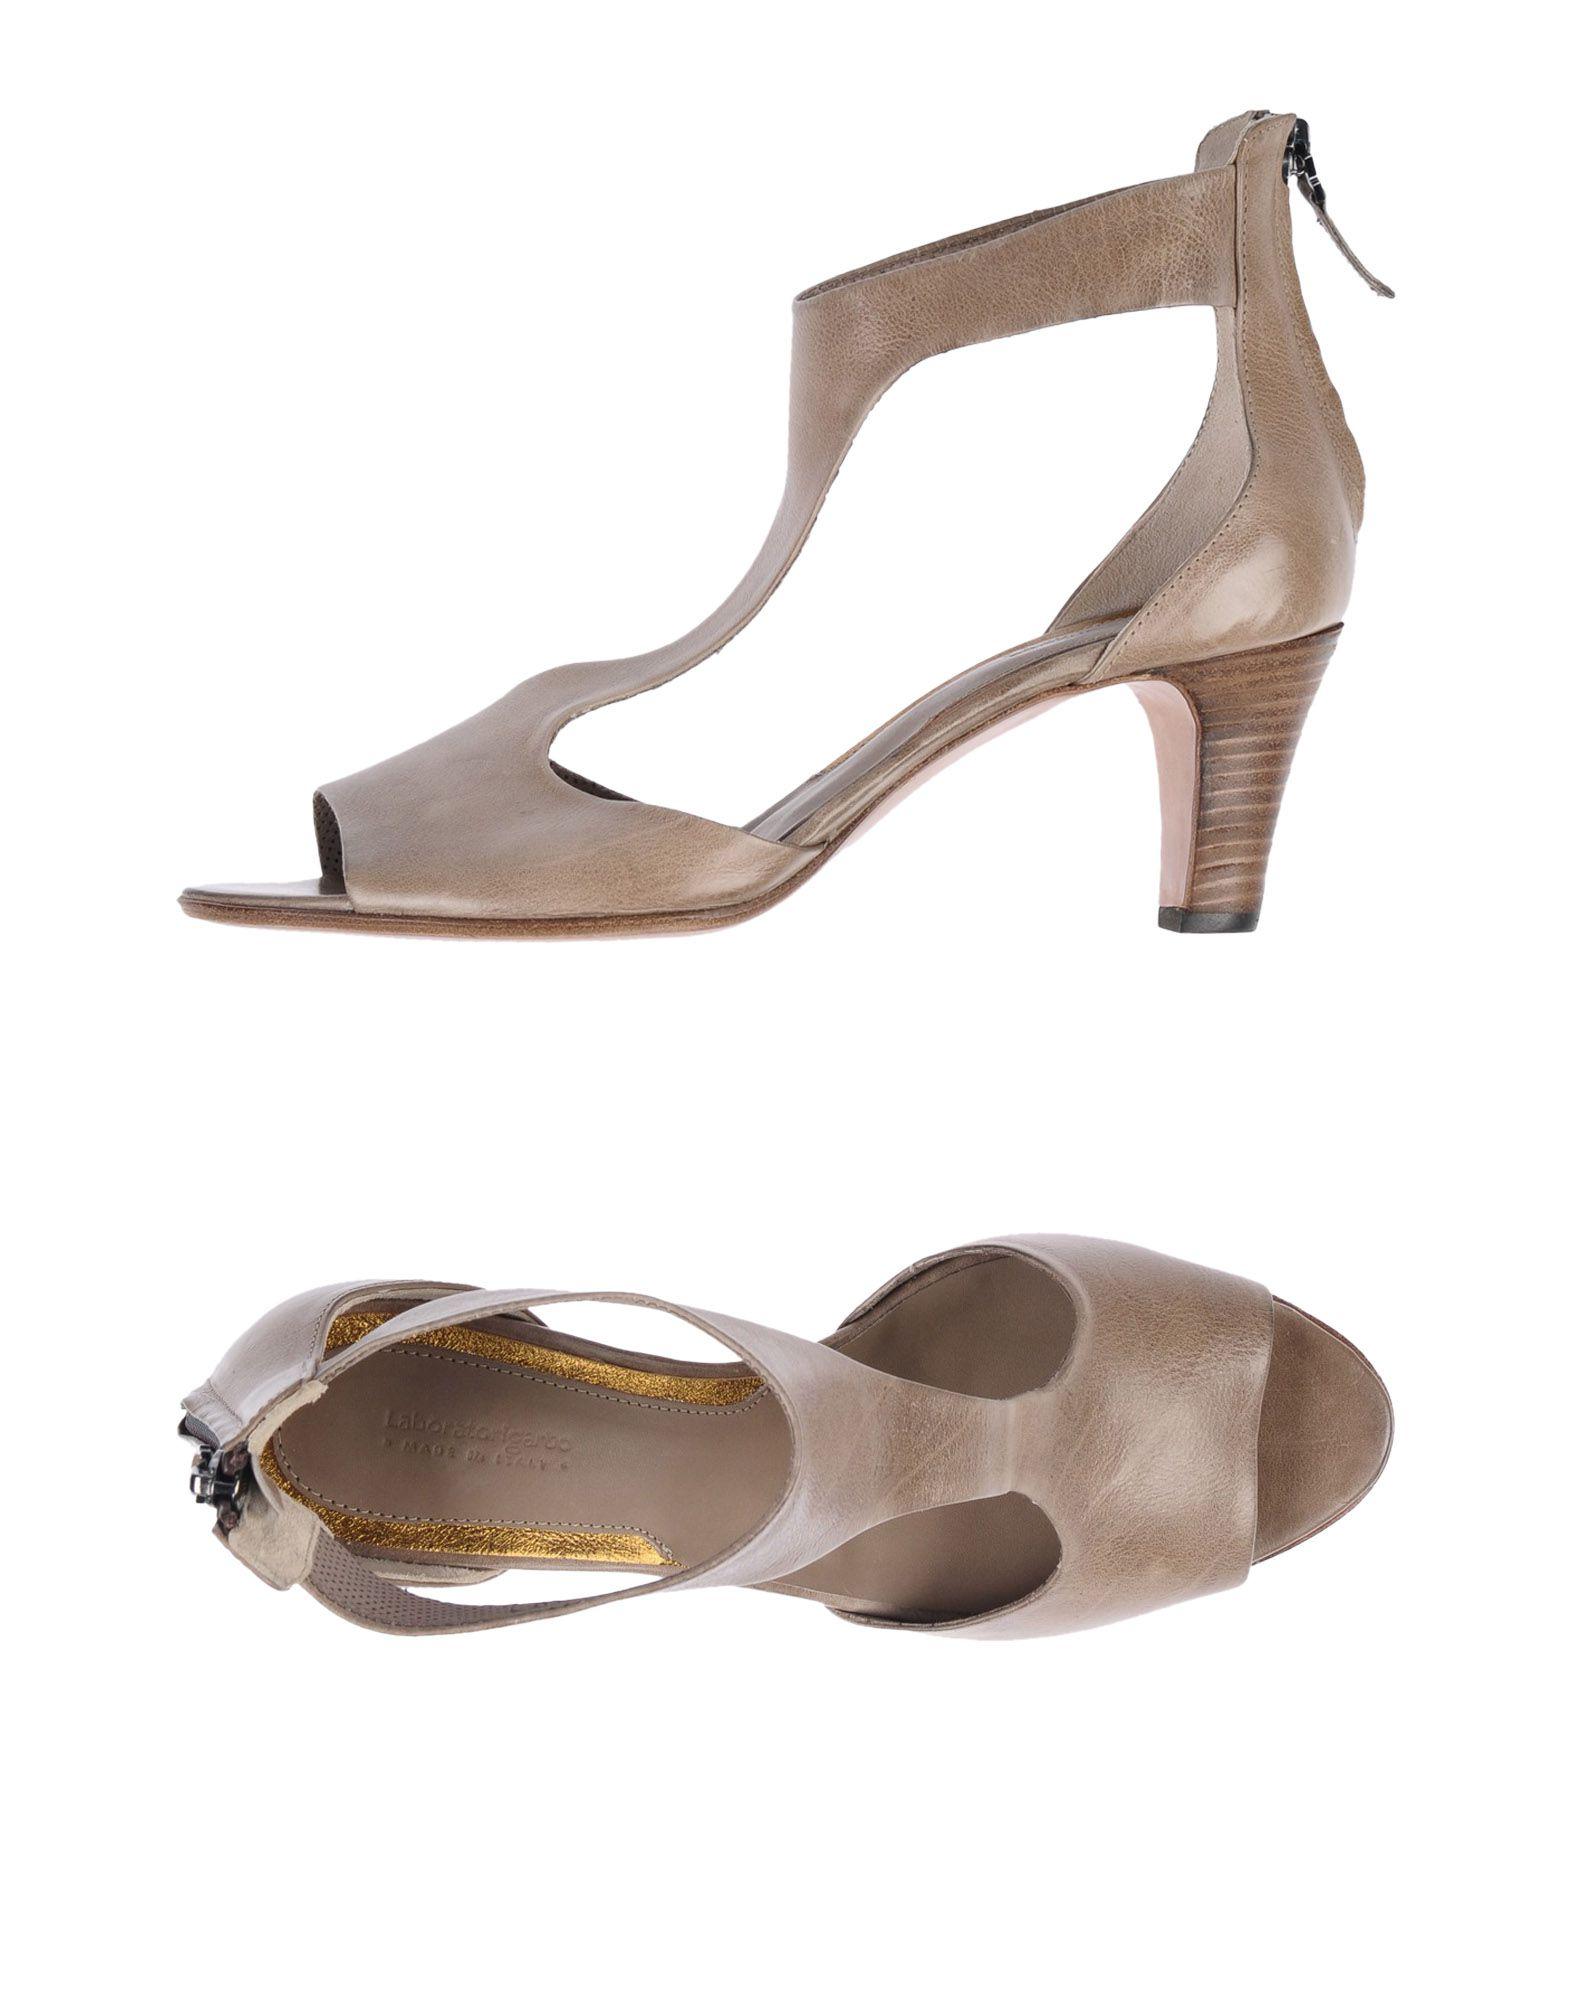 LABORATORIGARBO Sandals in Grey